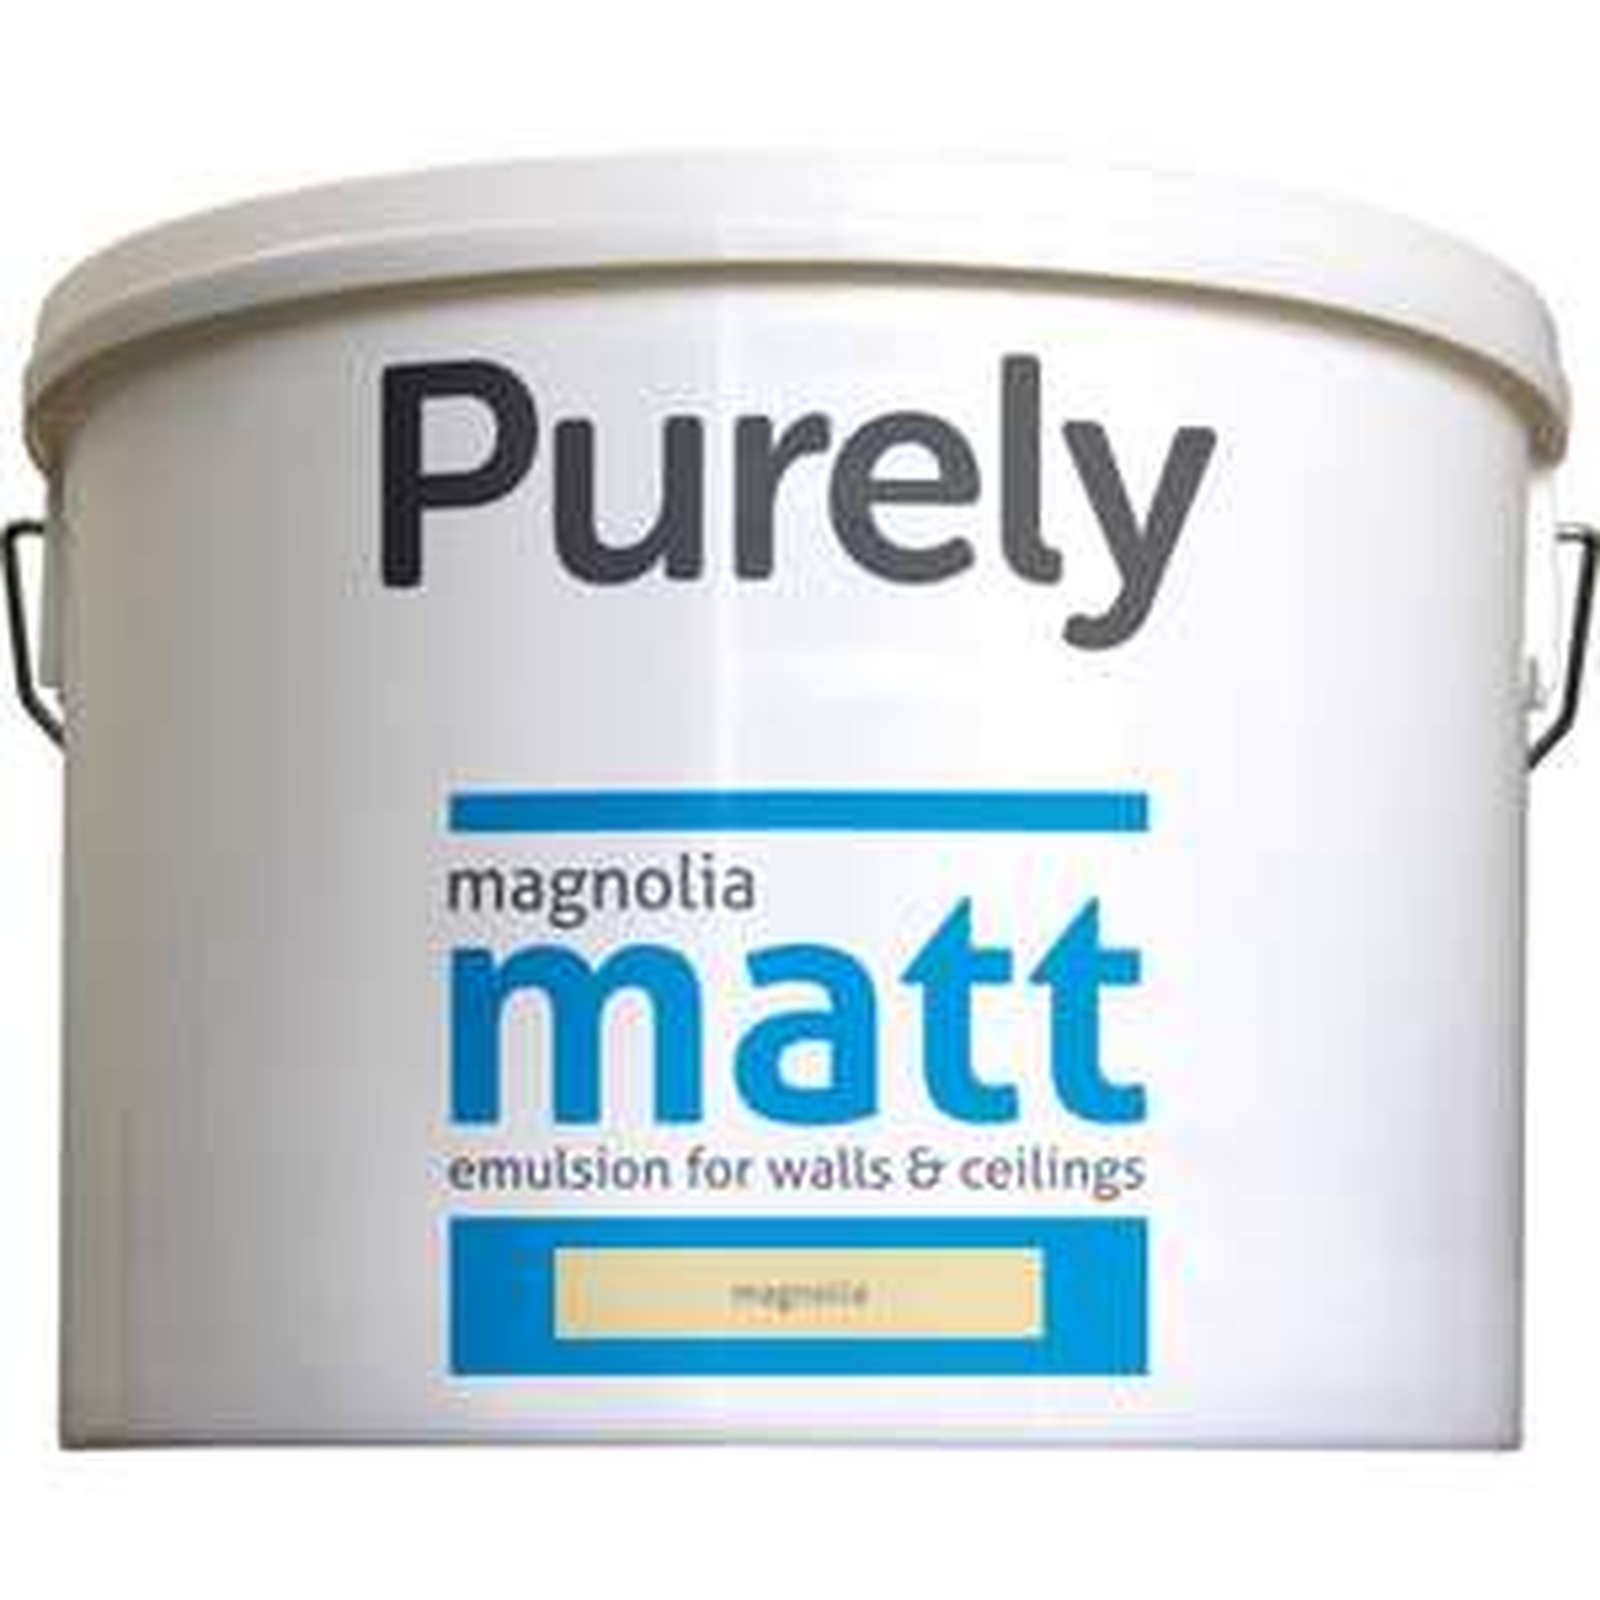 Purely Matt Emulsion Magnolia - 5L for £1.43 @ Homebase (in-store)